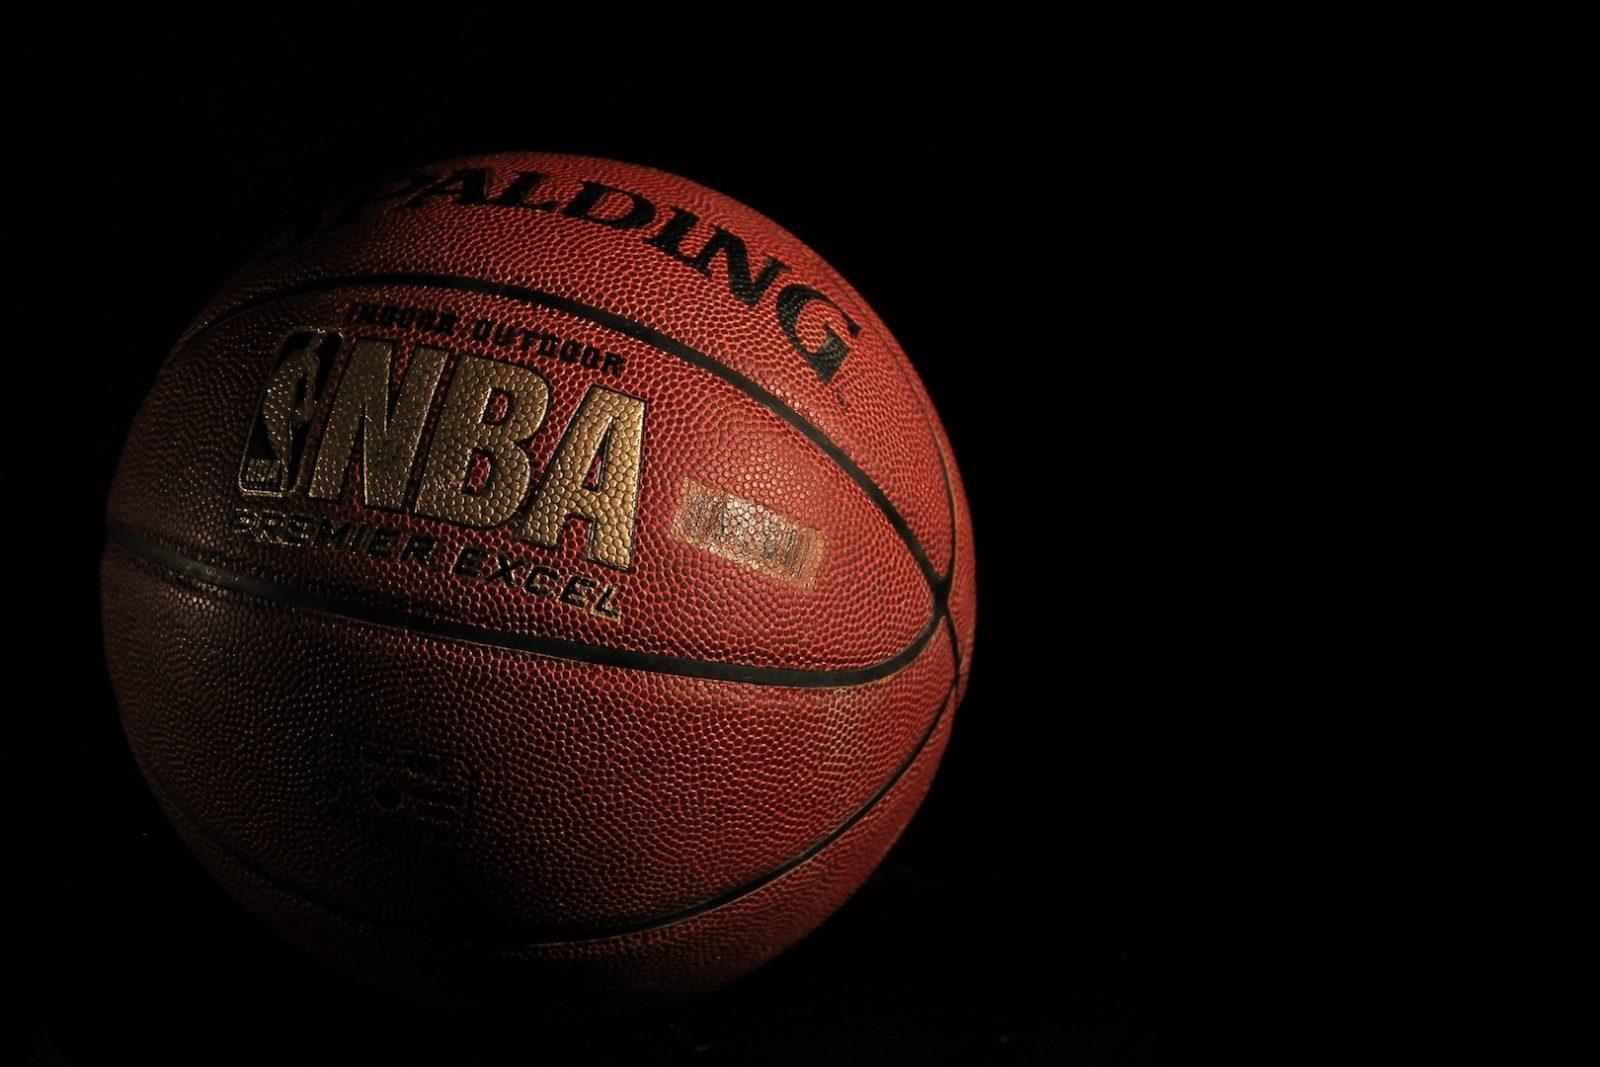 Siyah Arka plan üzerine nba basket topu